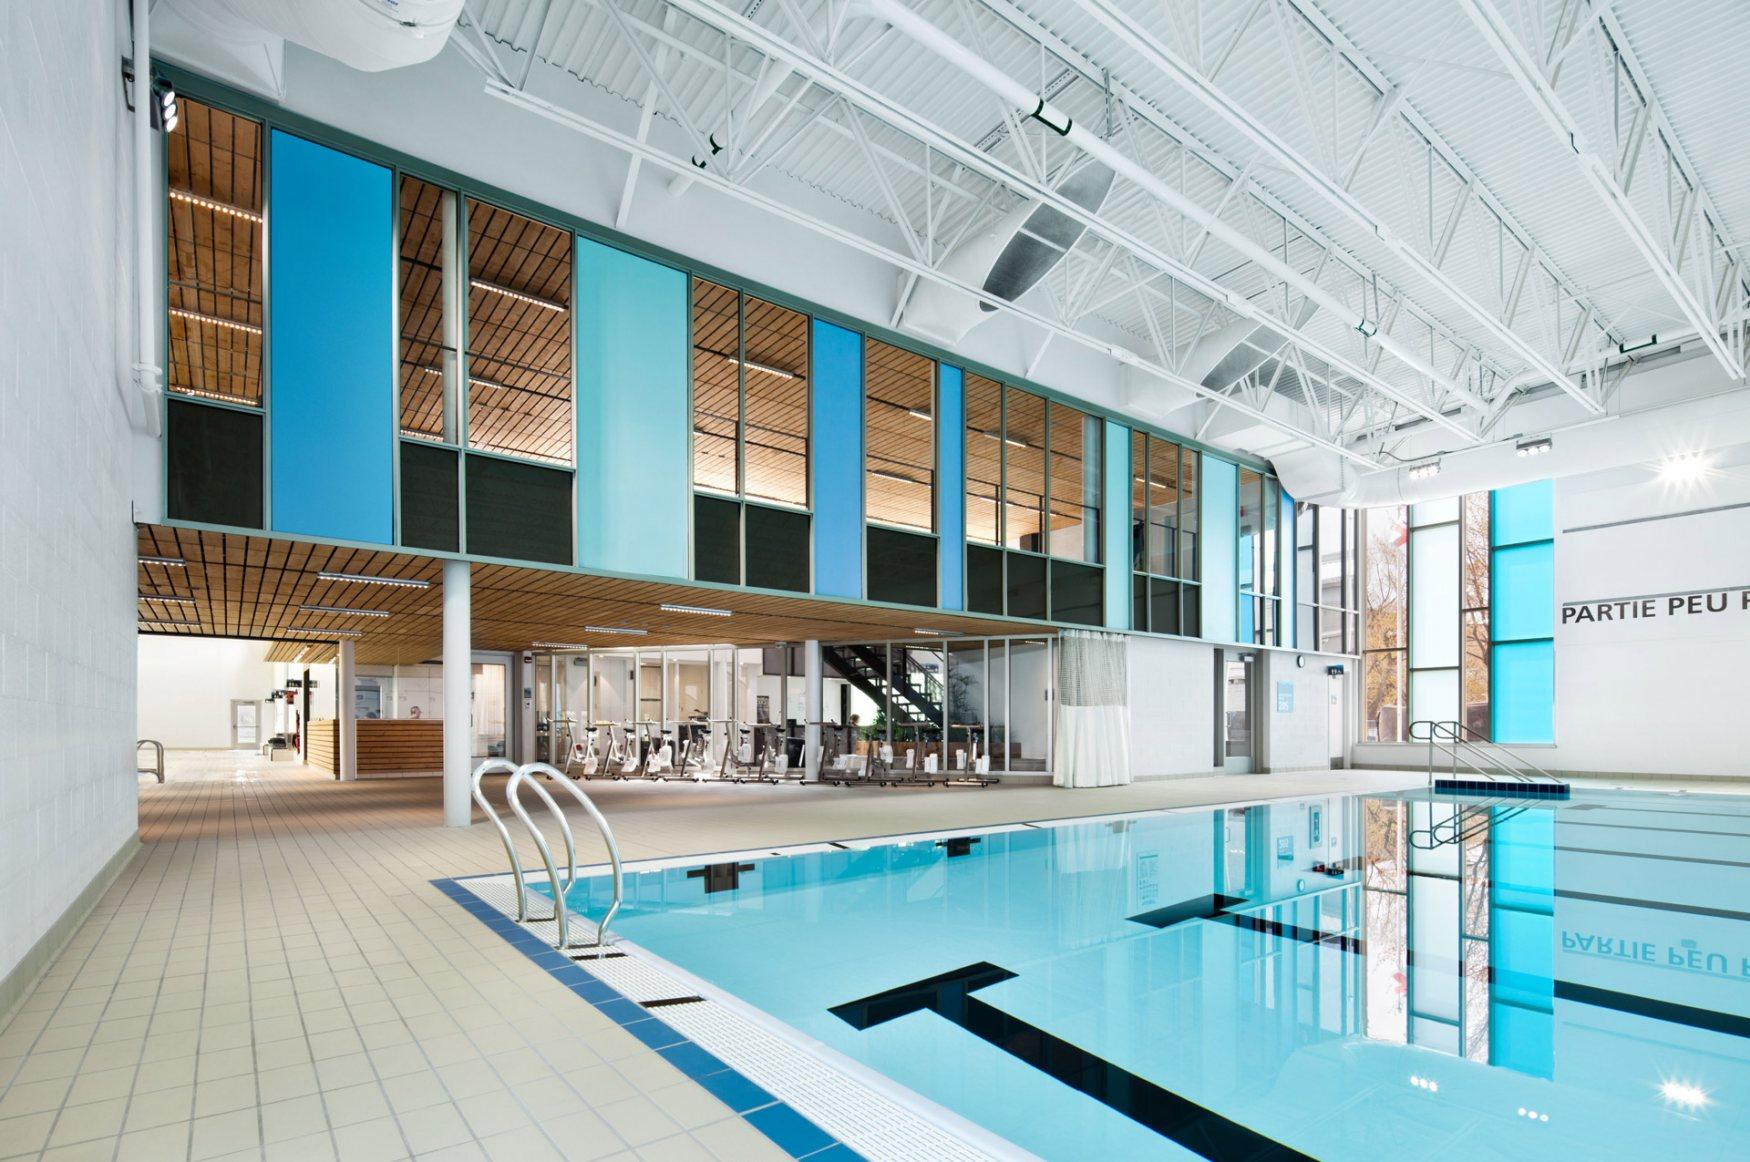 Annie Pelletier pool complex